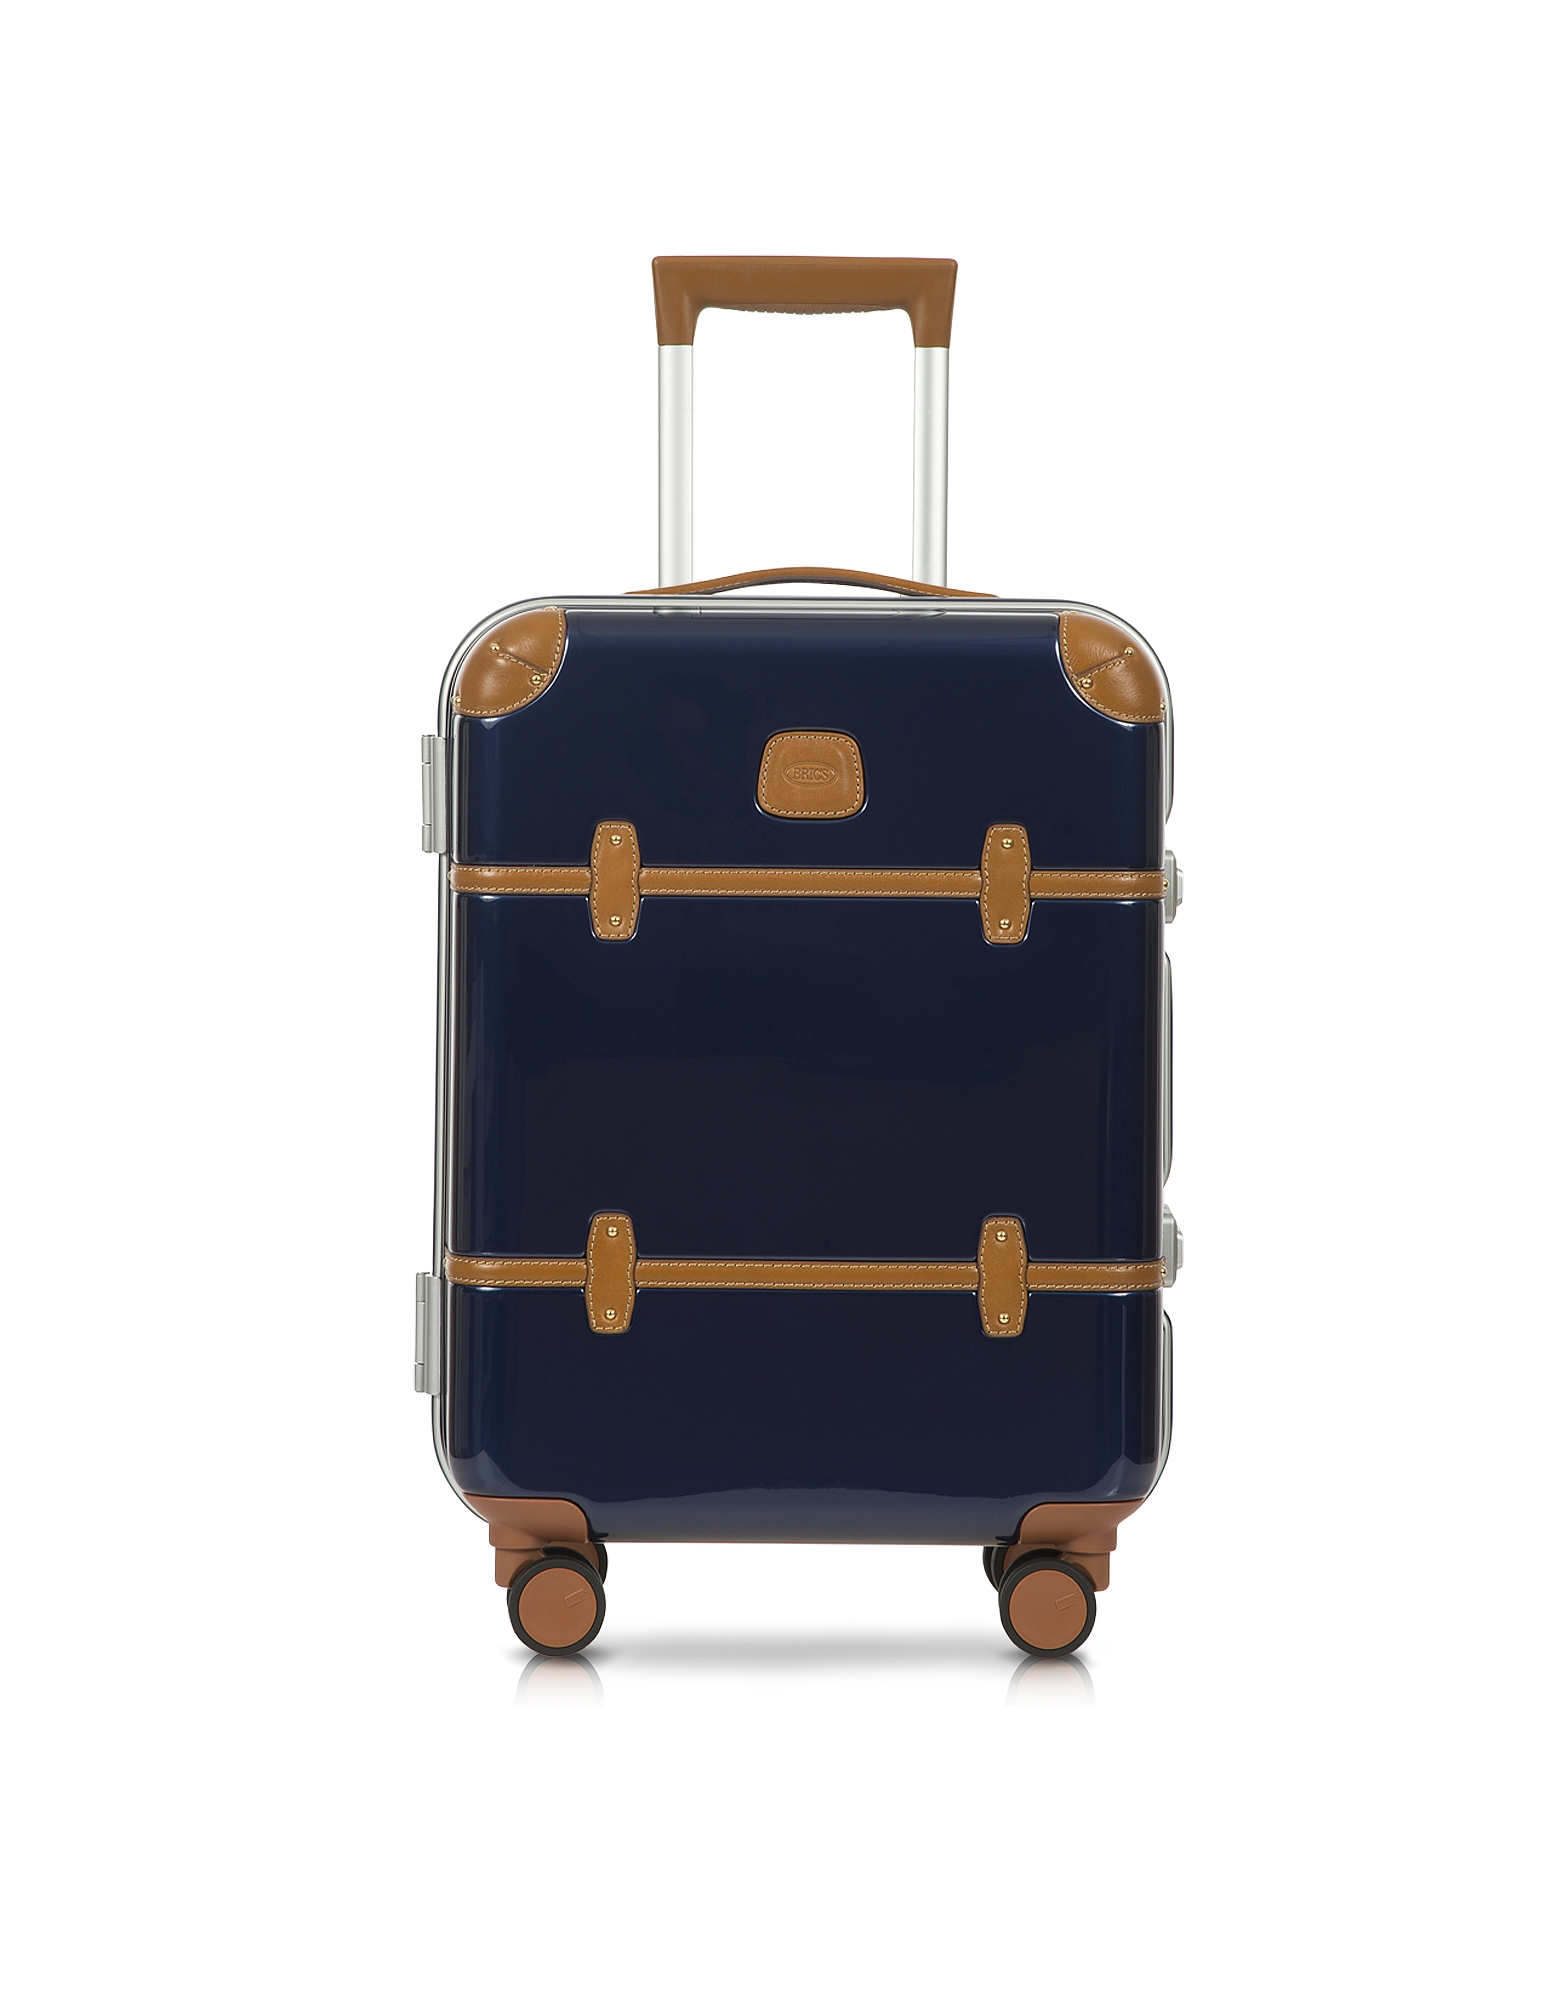 Bric's Travel Bags, Bellagio Metallo V2.0 21